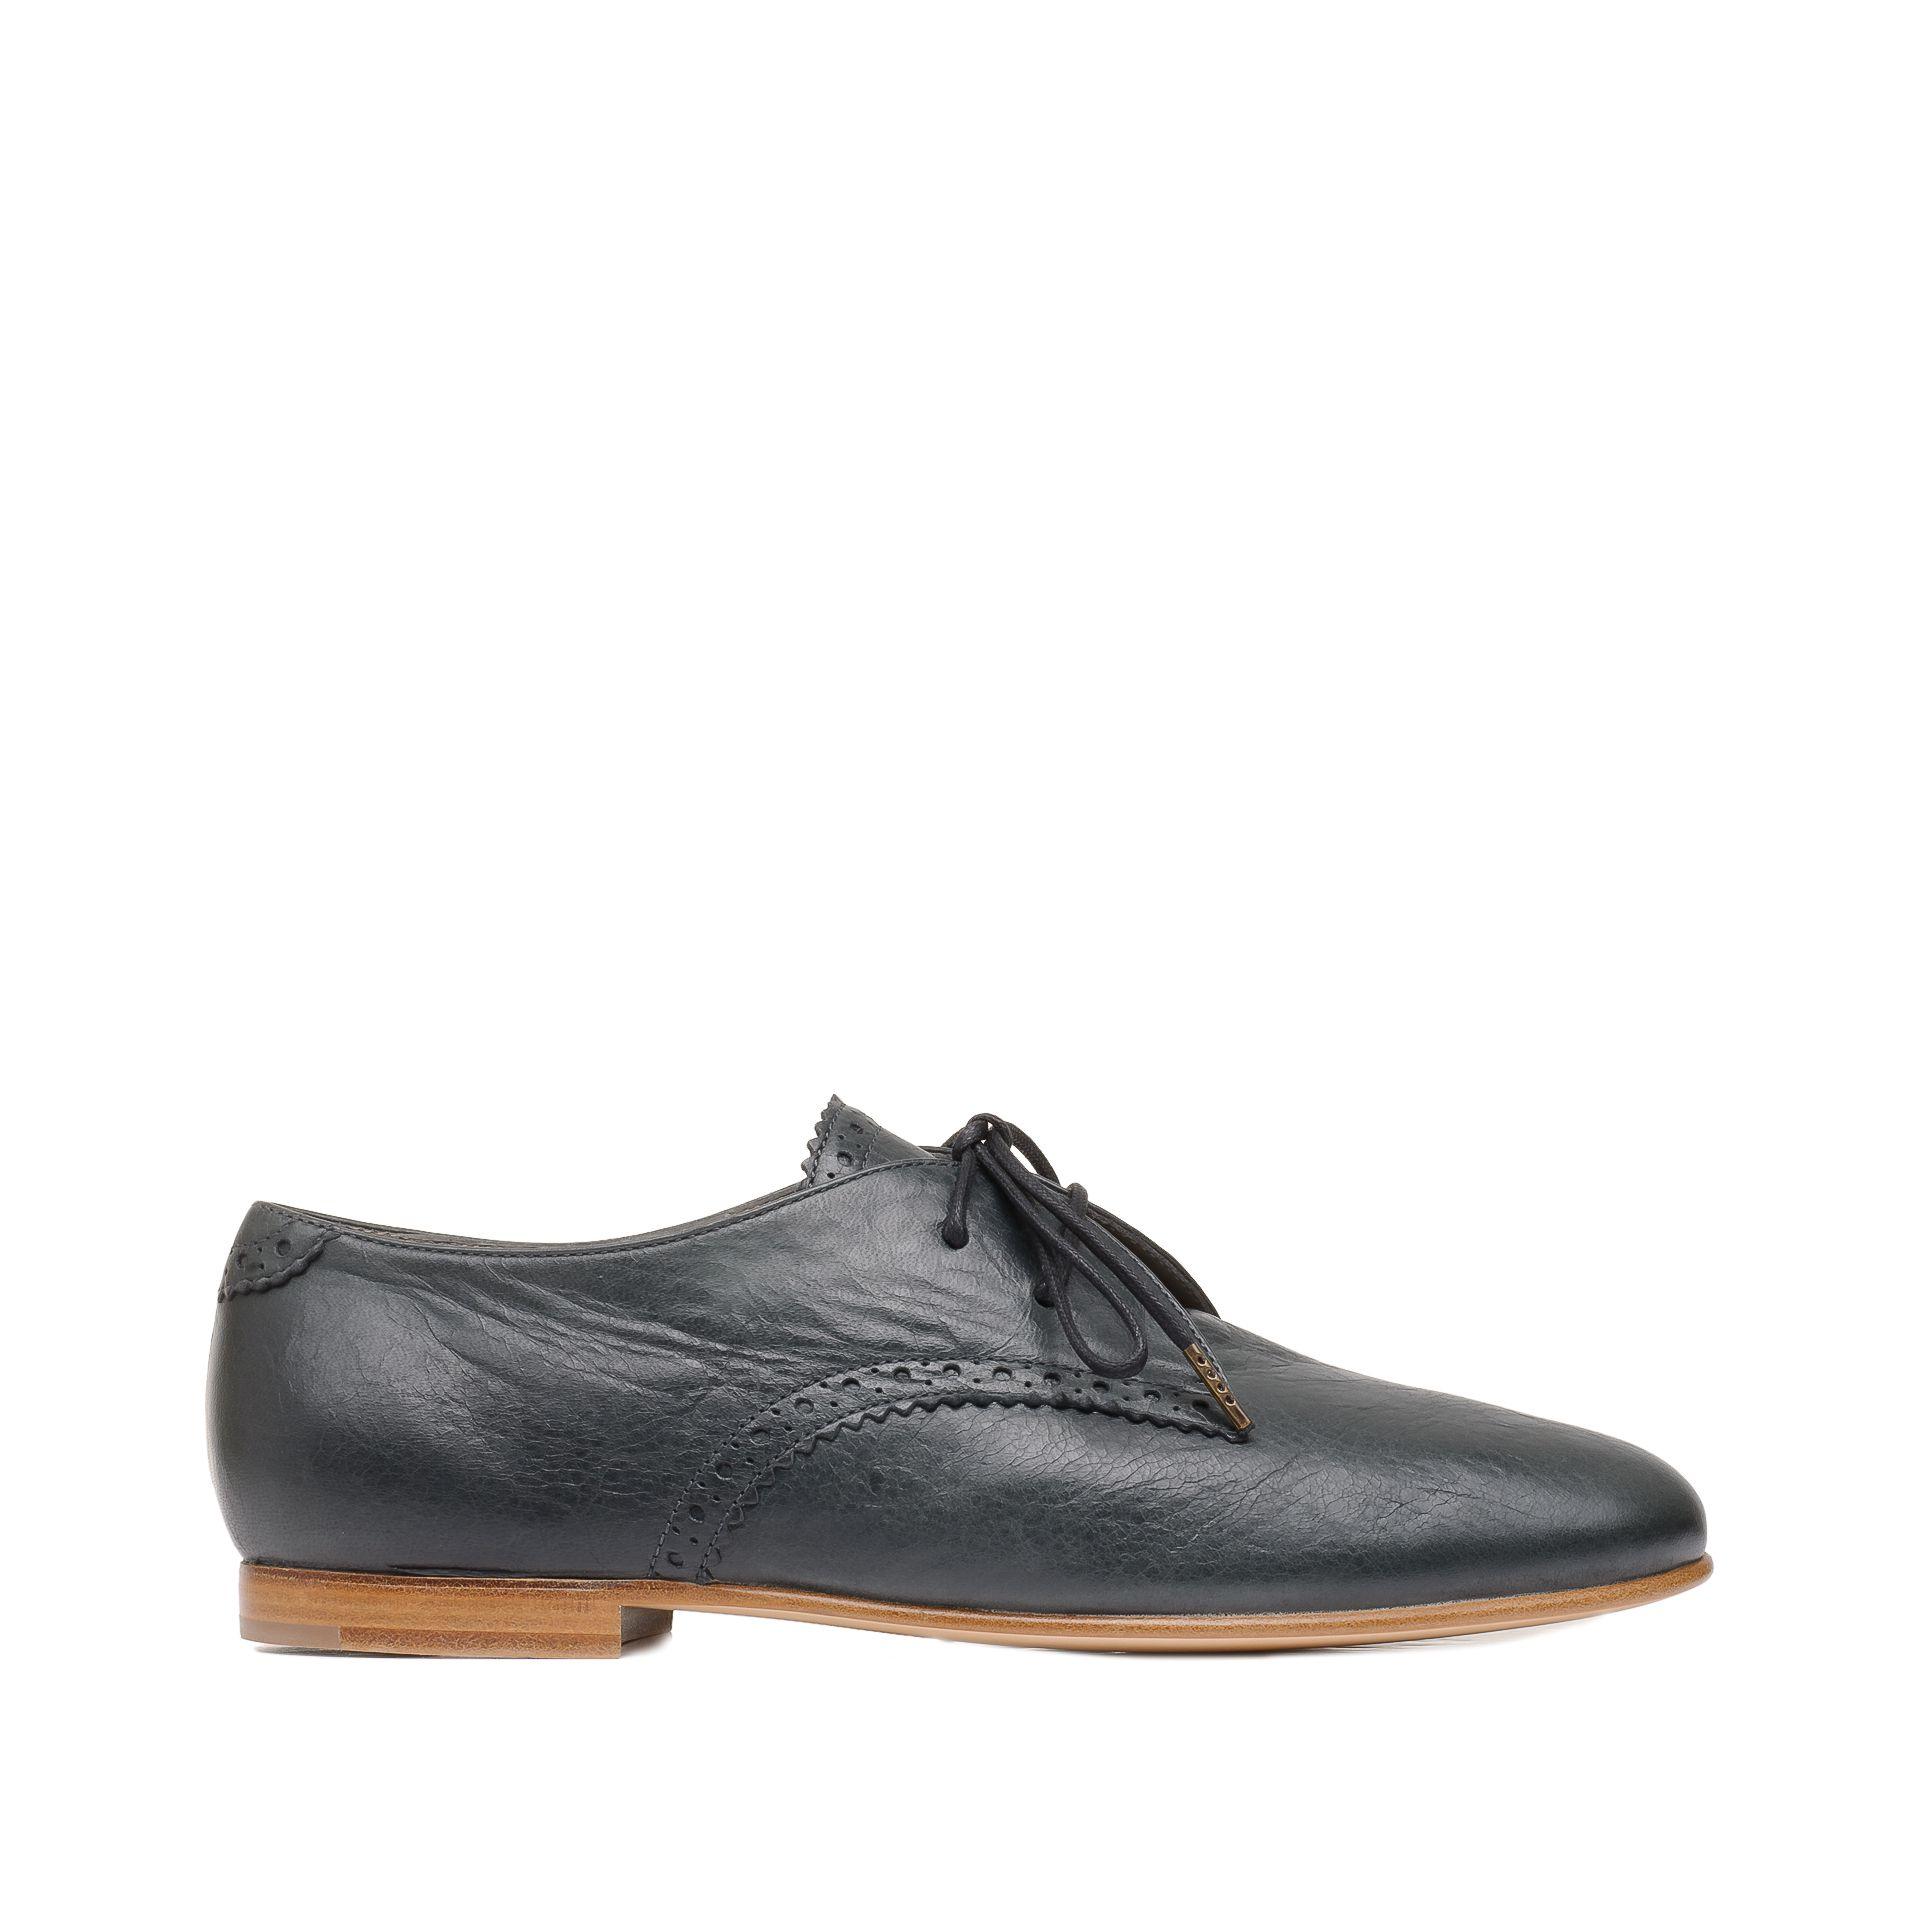 BALENCIAGA Balenciaga Derbies Arena Chaussures à lacets D f